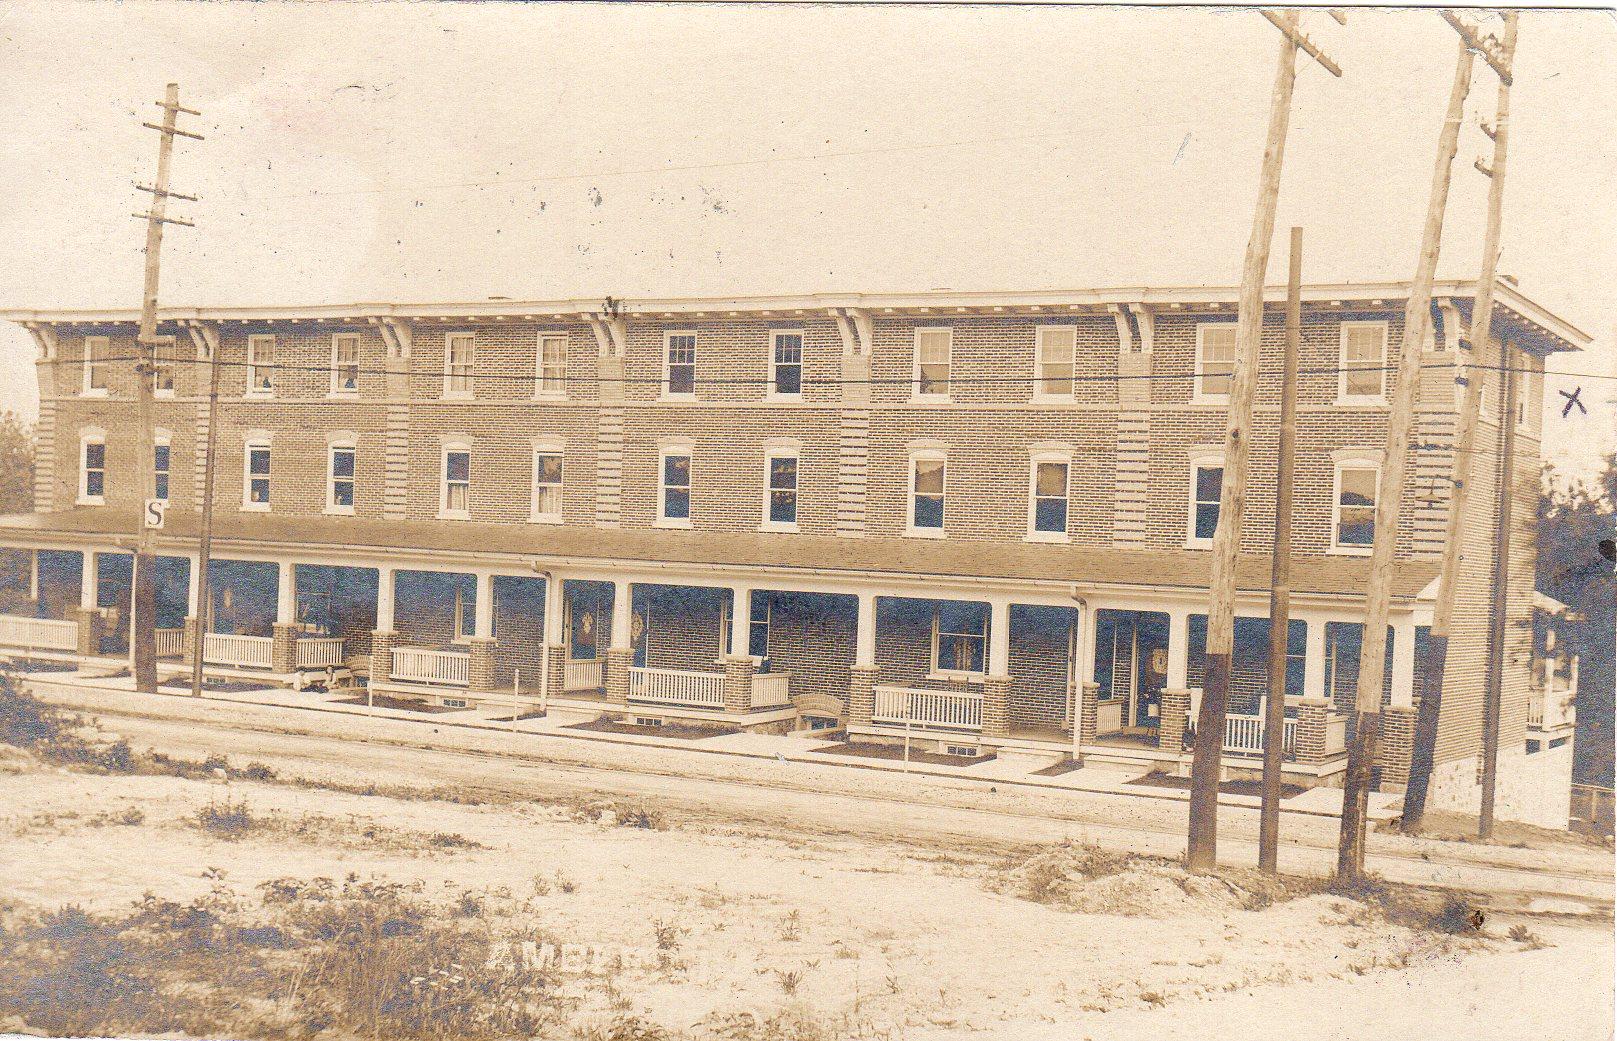 Post Card Collection (E Simon)_2682_46_Identified as Butler Pike & Bethlehem Pike, Ambler, Pa_9 Jul 1907